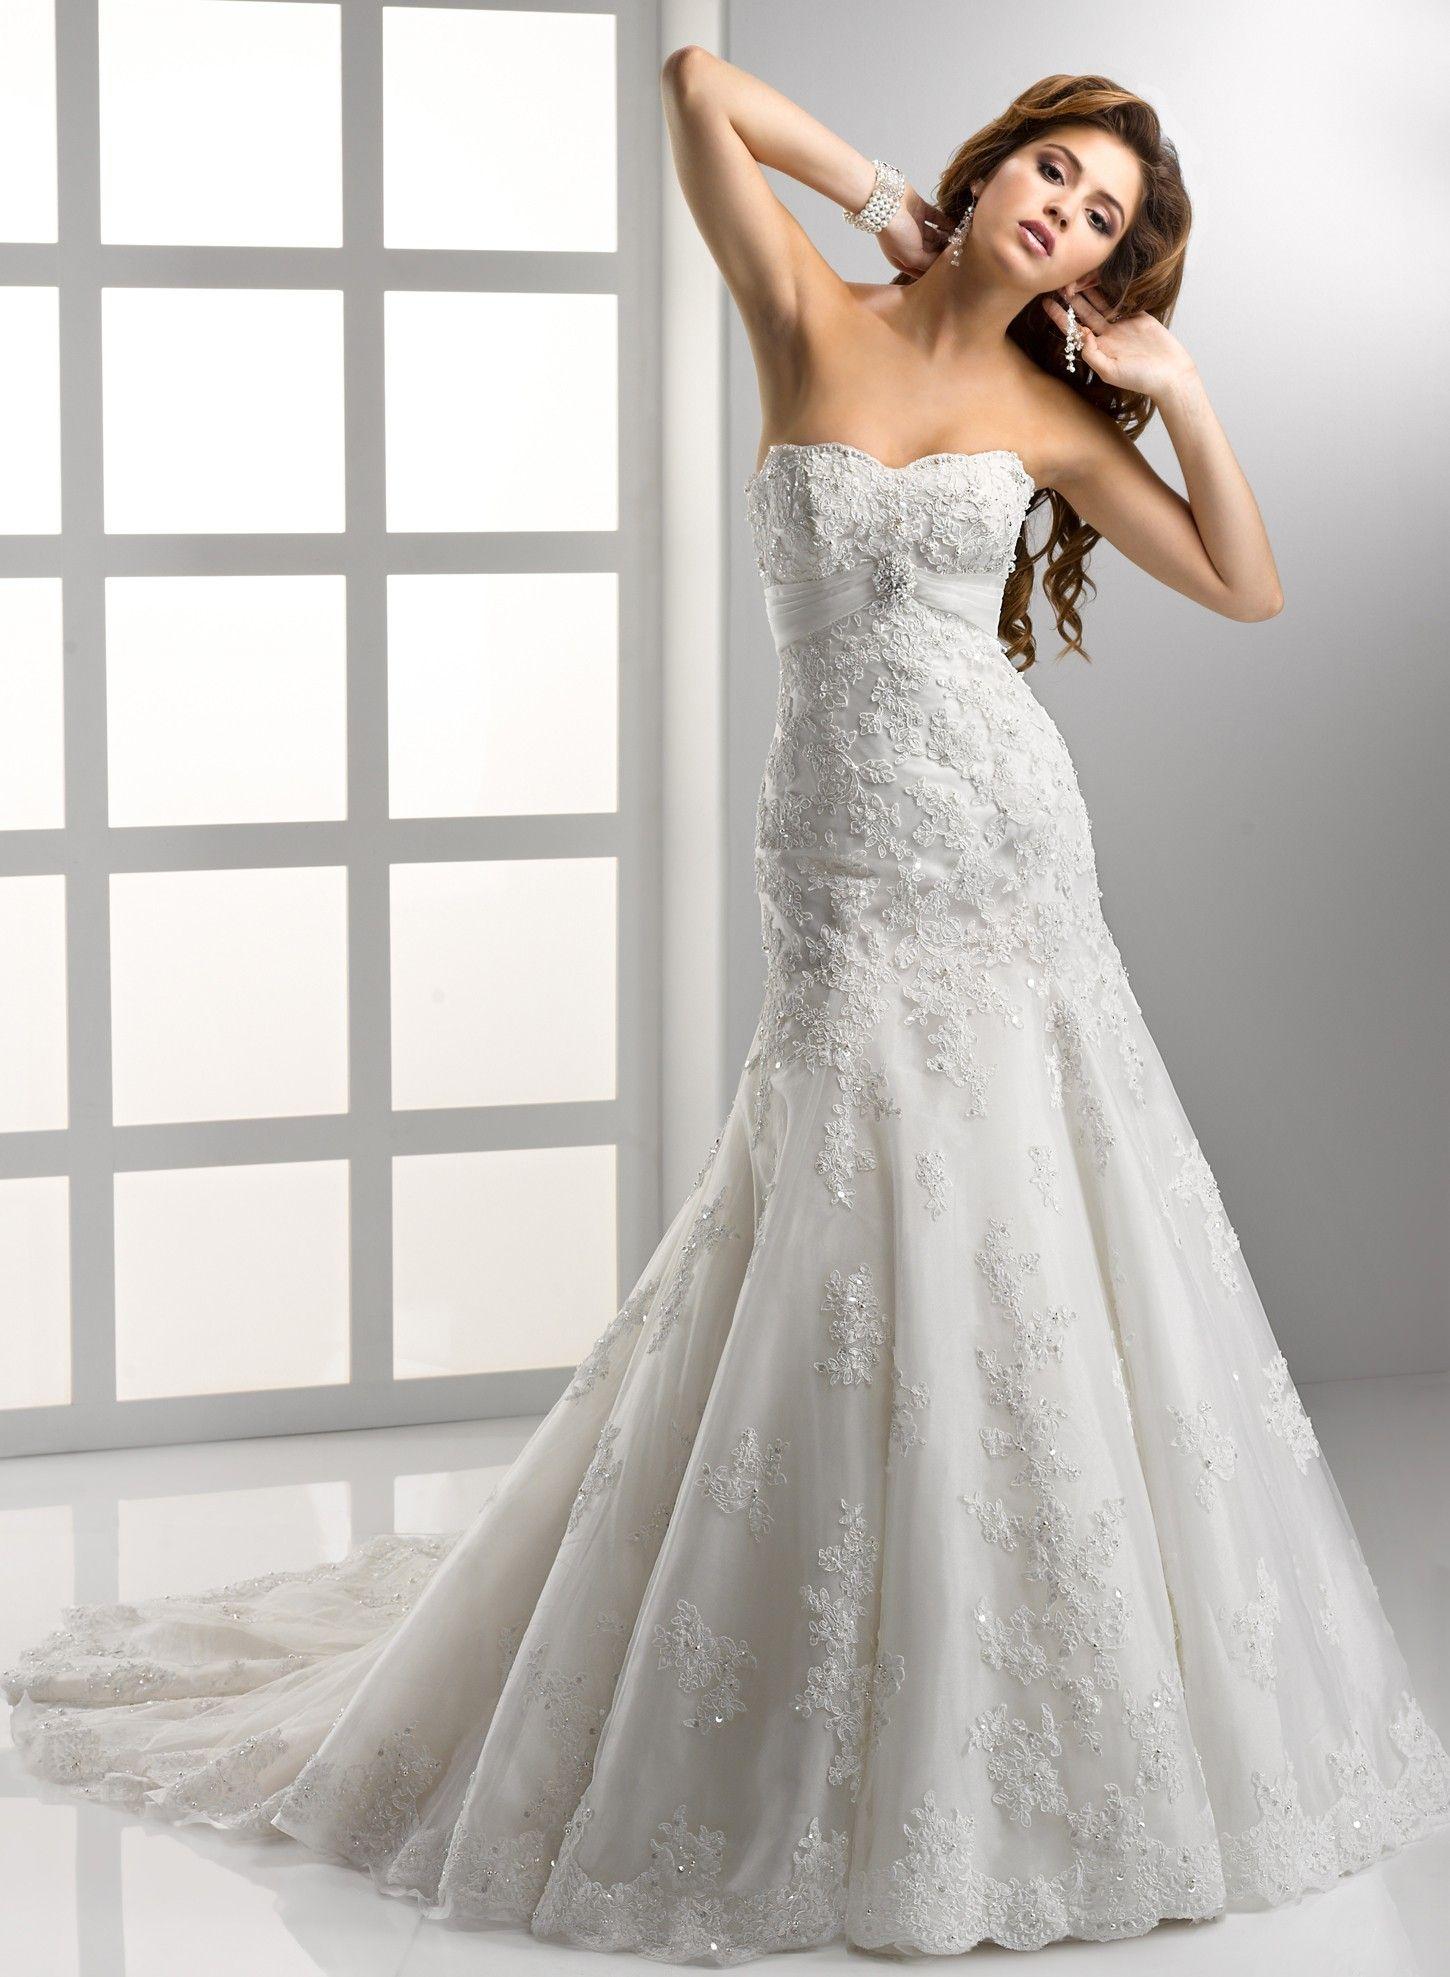 35 Most Beautiful Wedding Dress | Wedding dress, Dresses uk online ...